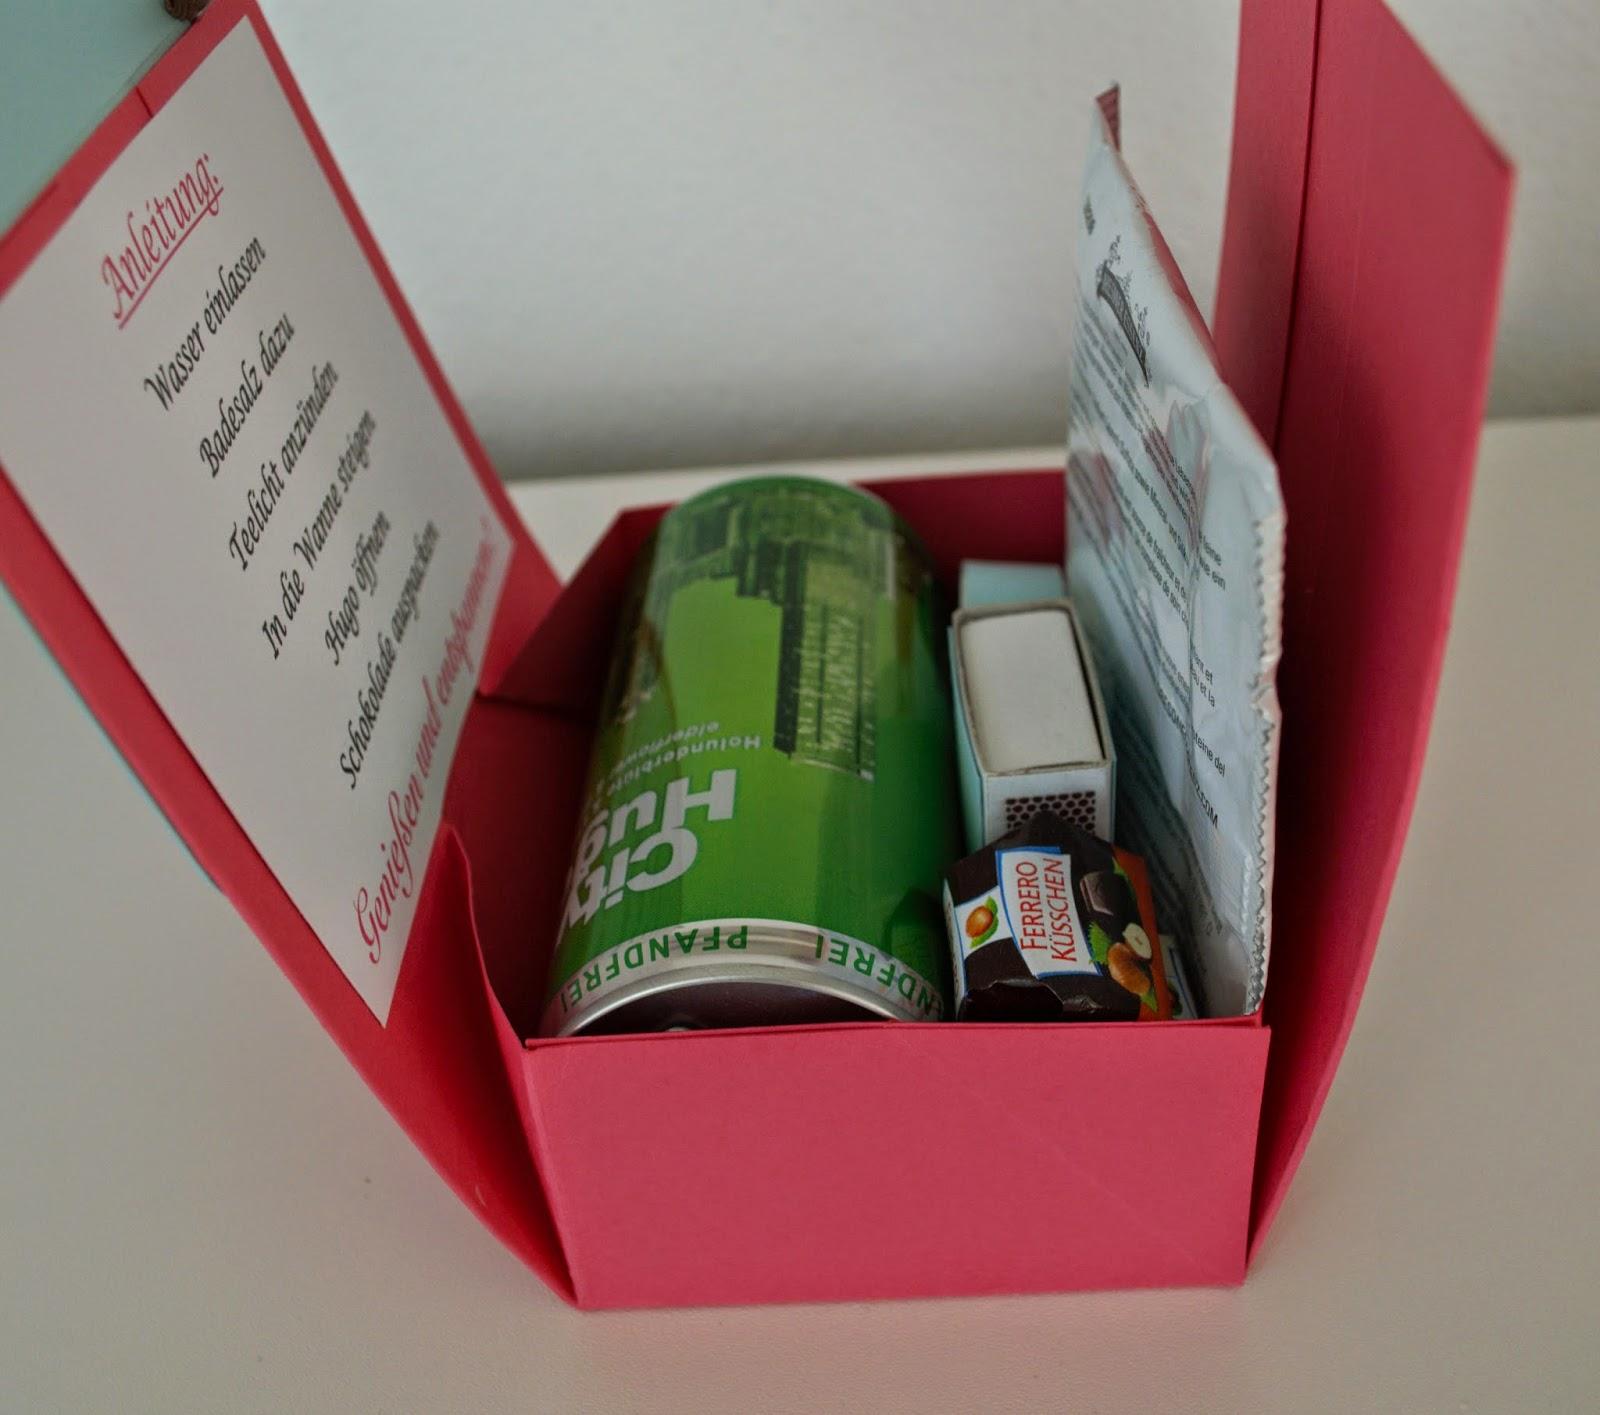 Beliebt Bevorzugt Paperdesign 4you: Wellness to go... #EX_22